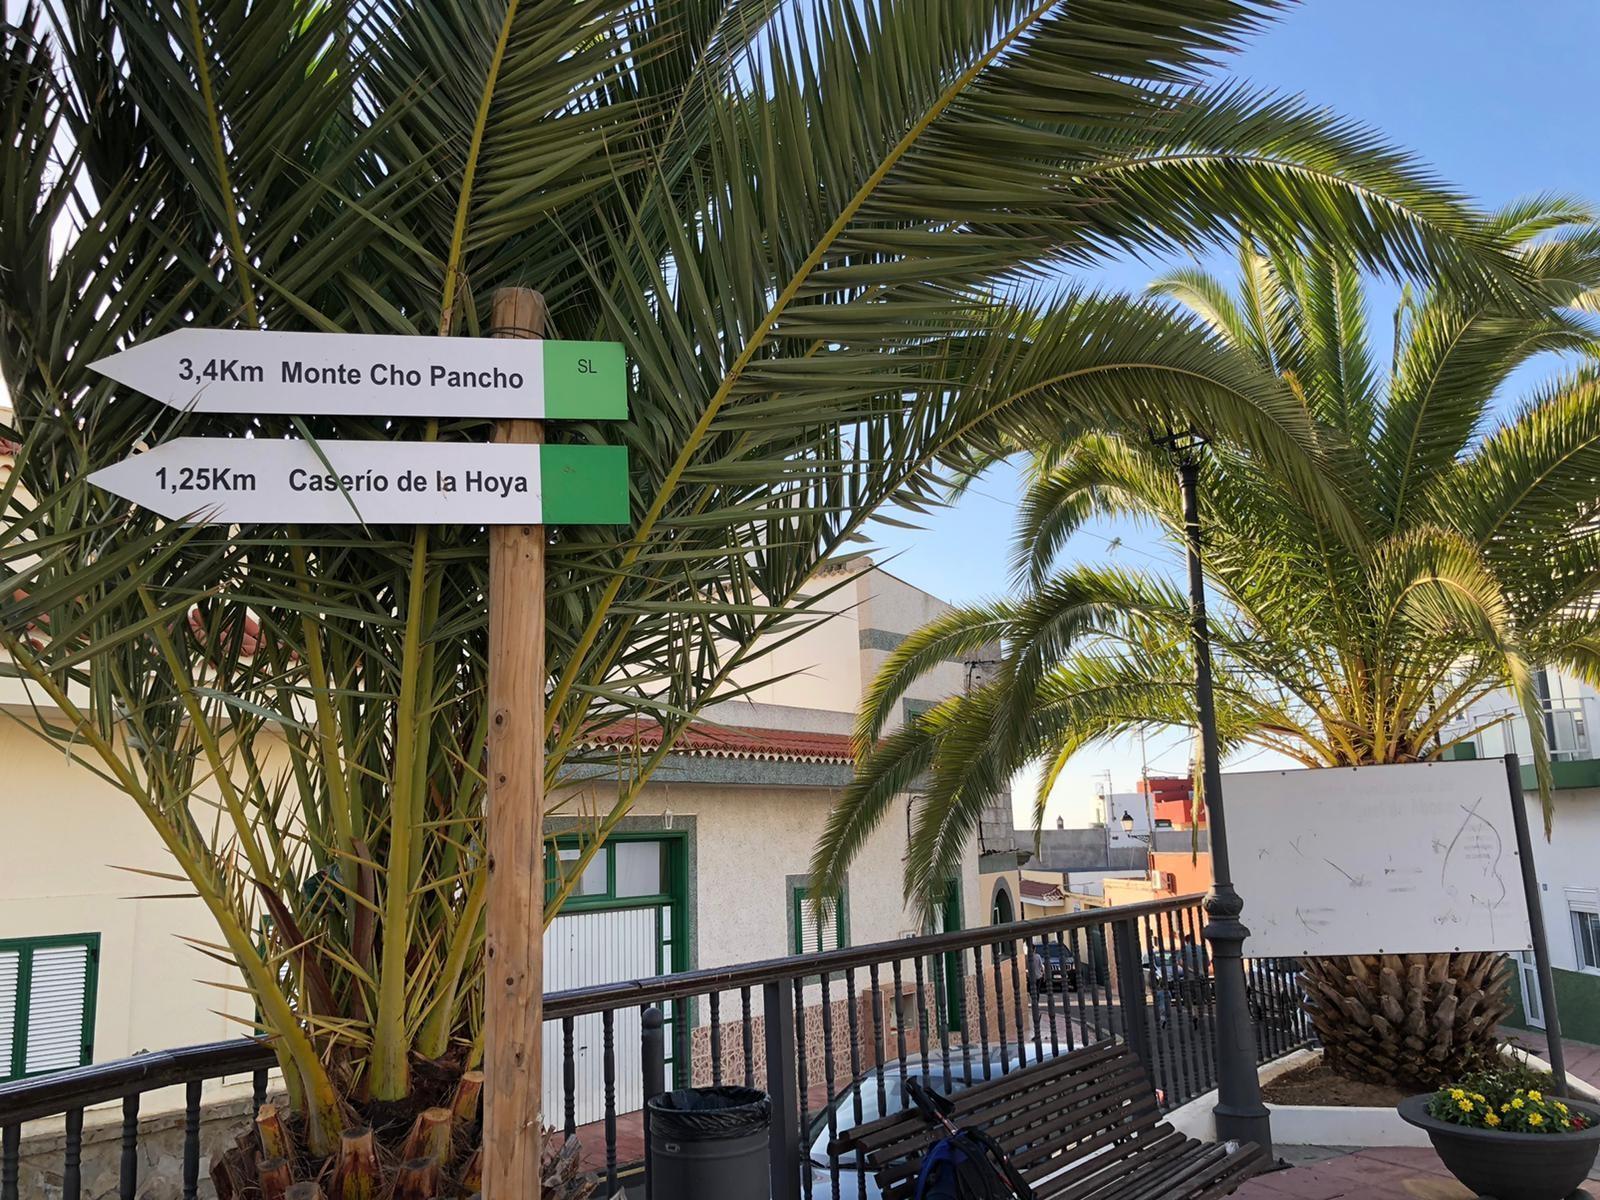 Start der Wanderung el Roque-Cho Pancho